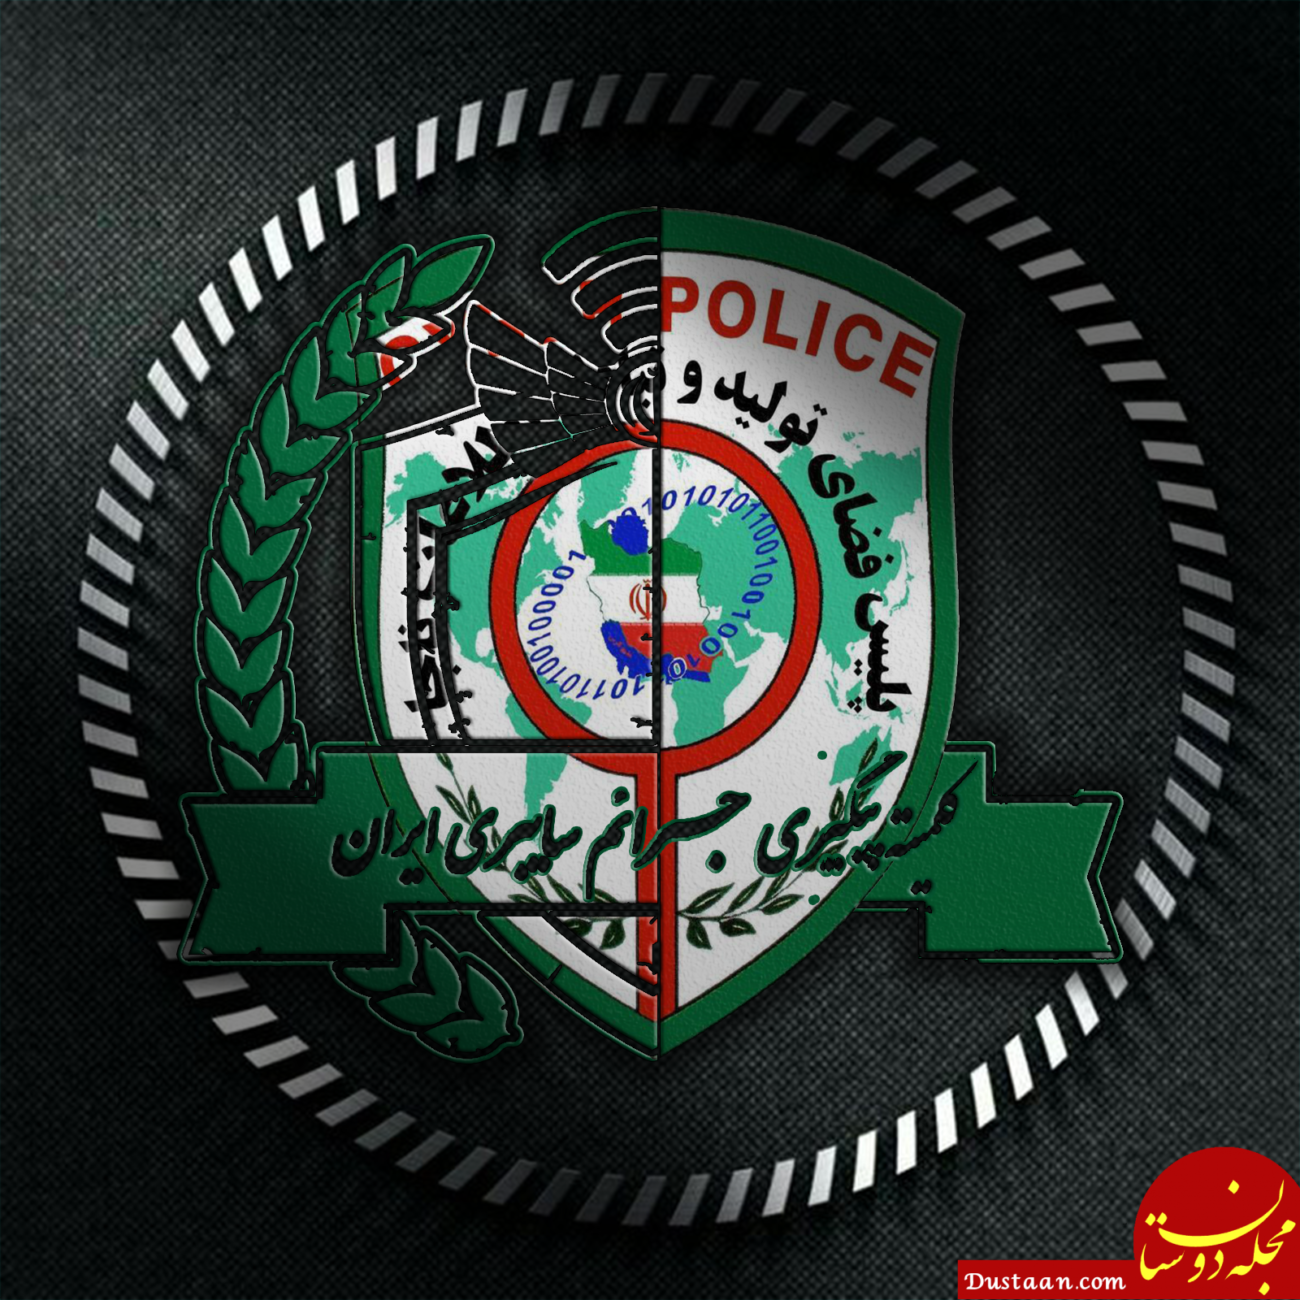 www.dustaan.com دستگیری سه نفر بخاطر انتشار تصاویر مستهجن در گروه های تلگرامی